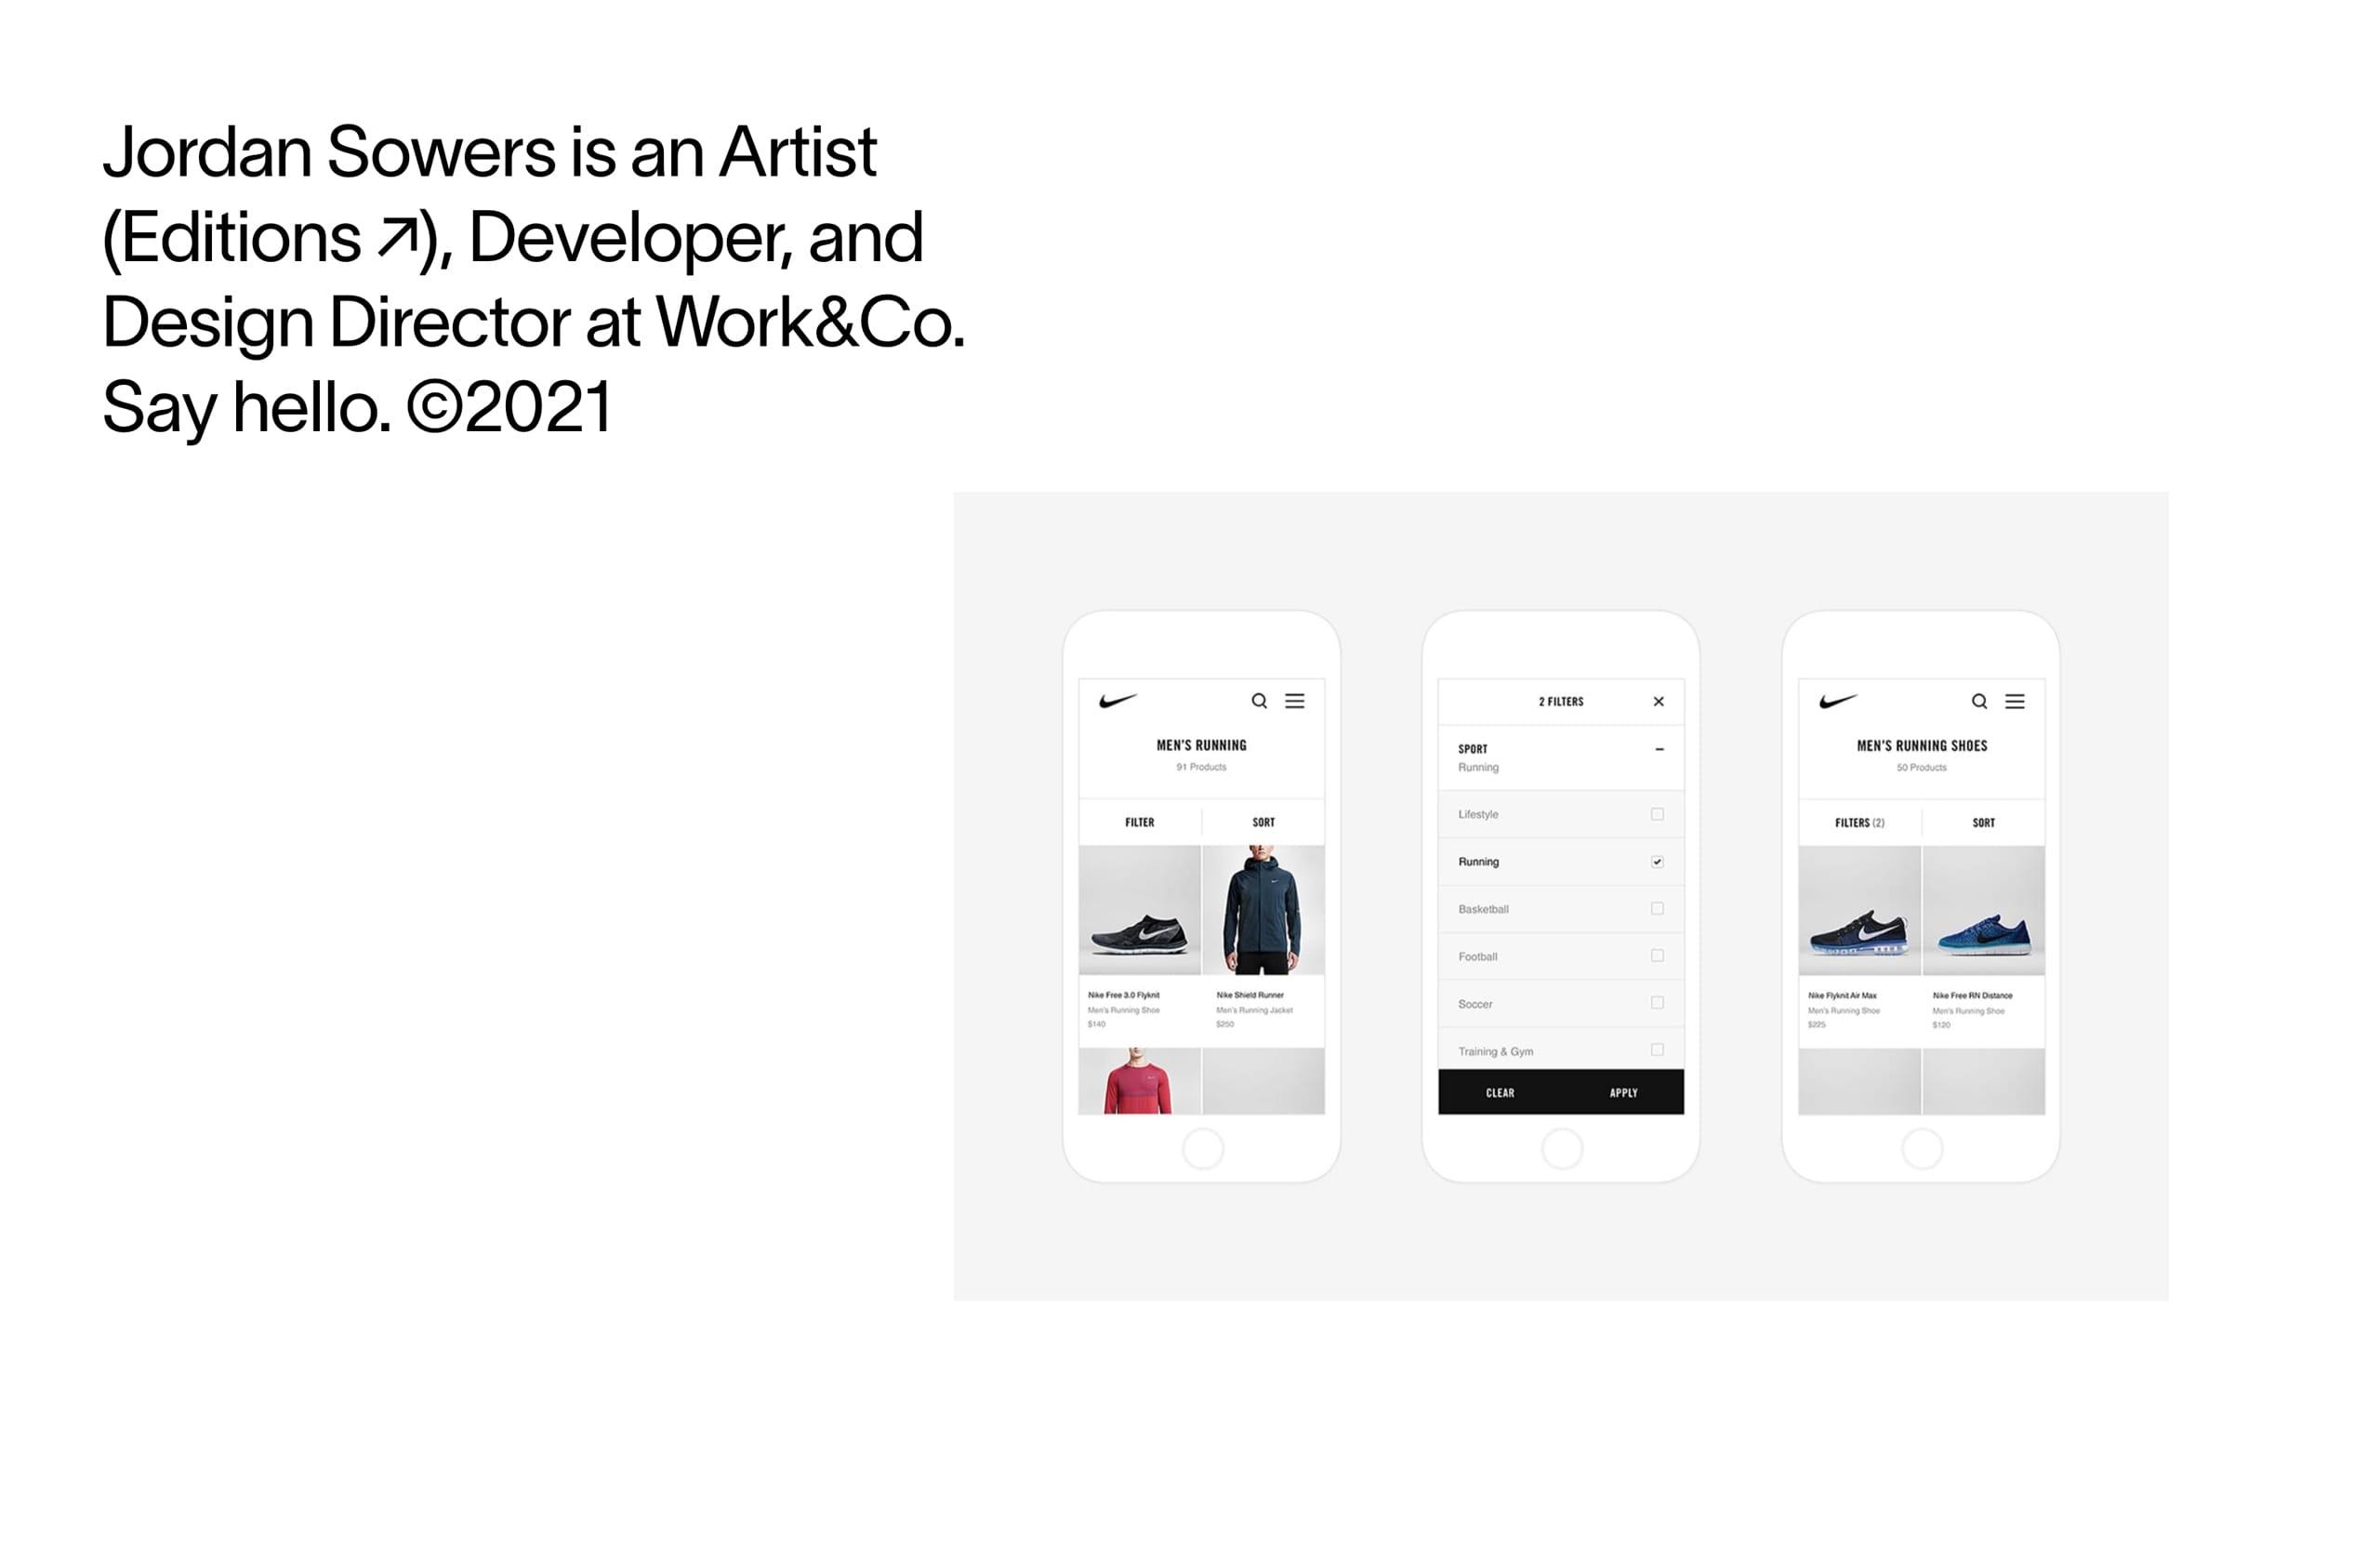 Jordan Sowers Website Screenshot